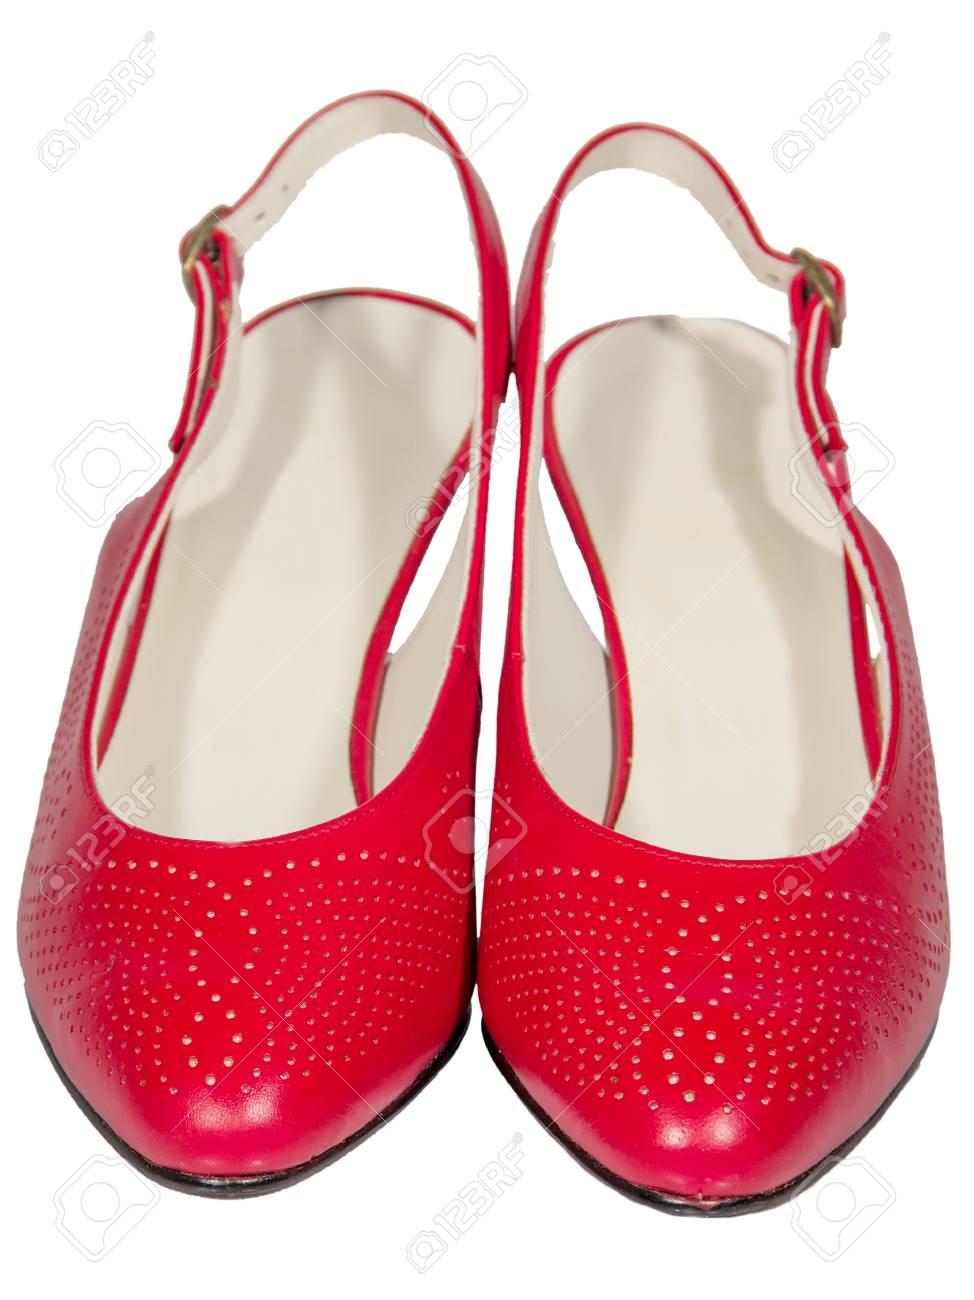 Chaussure Rouge Femme Talon A Talon Chaussure A xeEroQdCBW